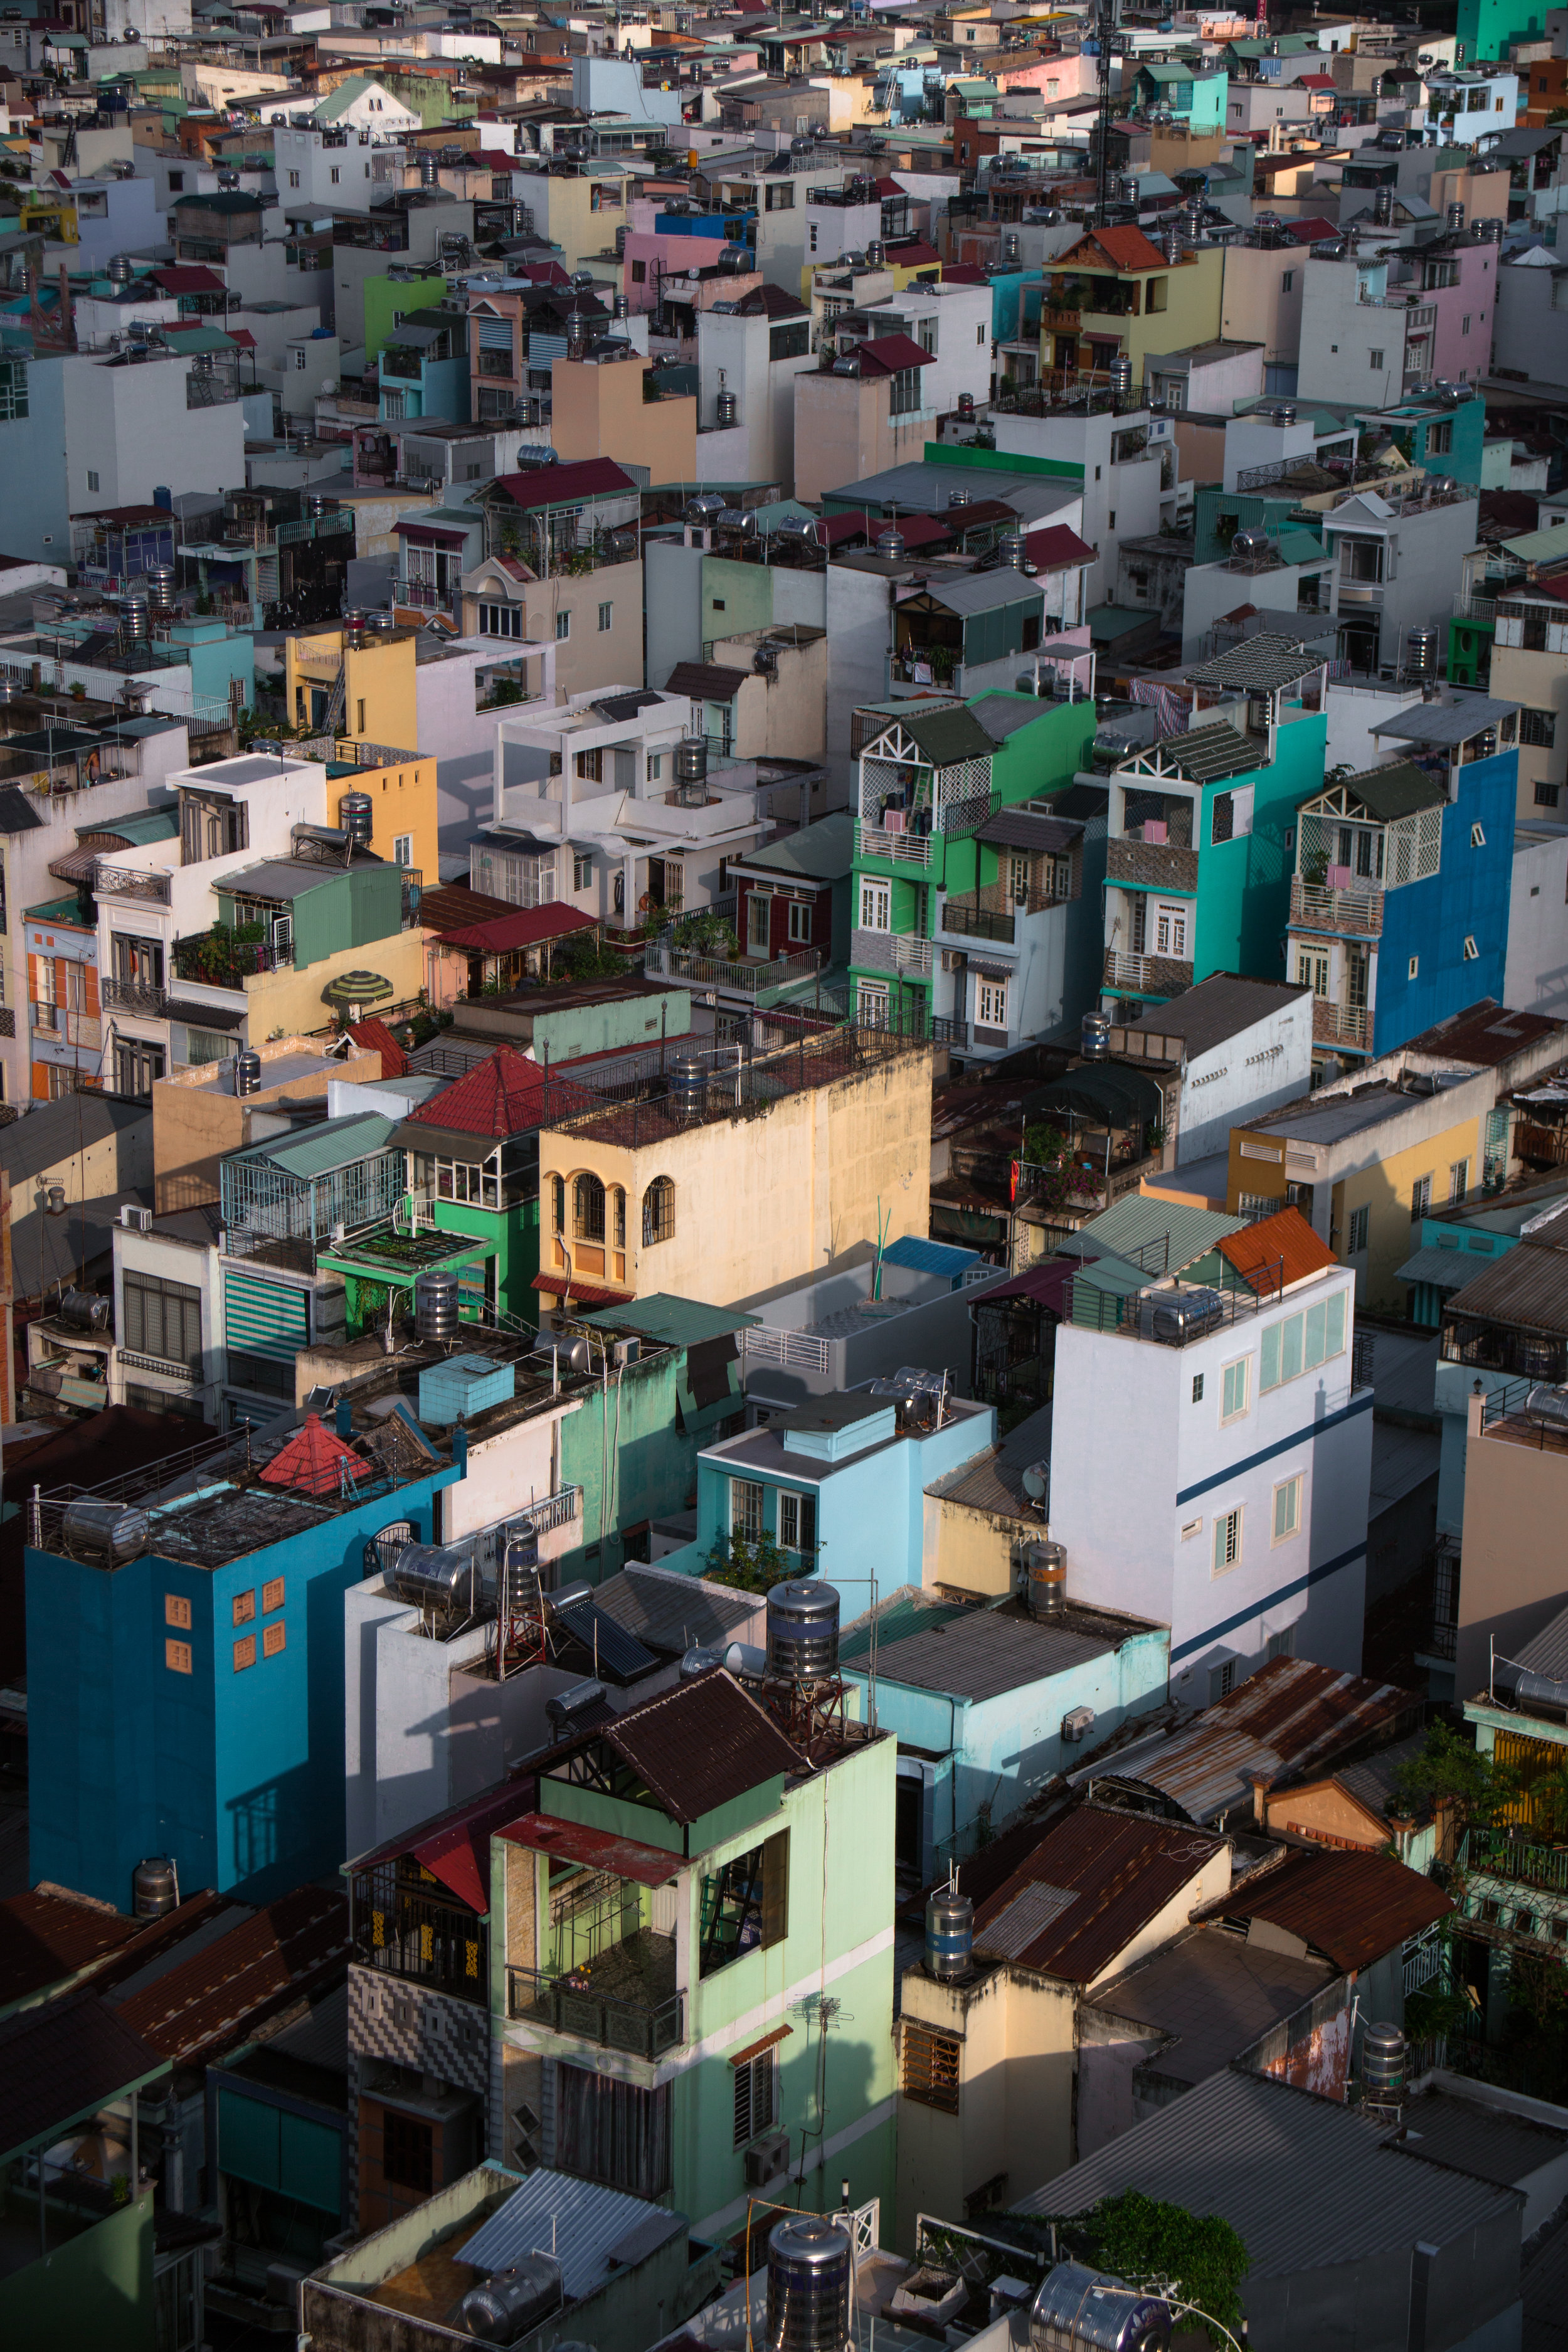 Shades of Saigon.